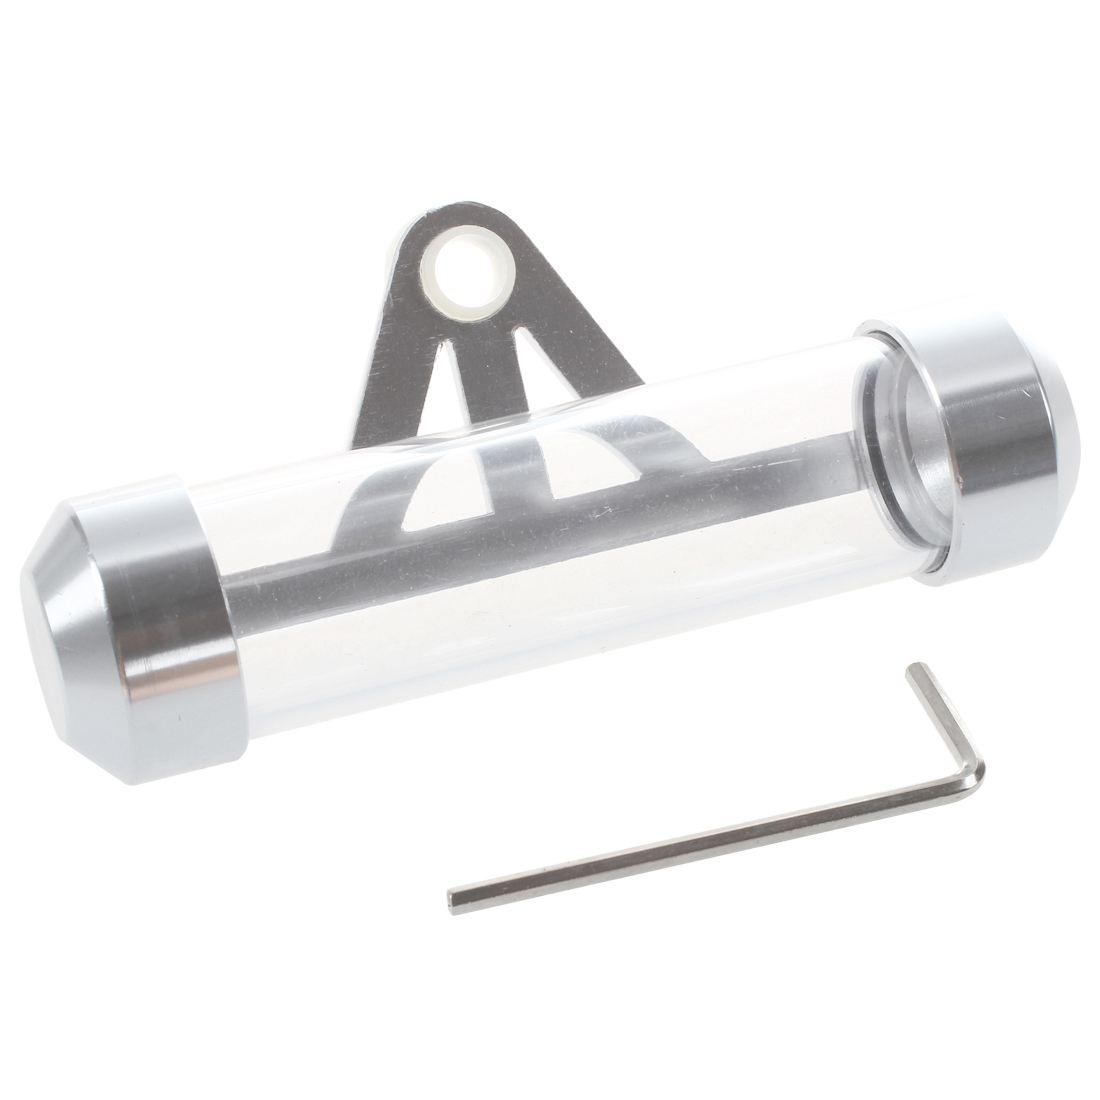 Soporte-tubo-disco-impuesto-metal-Moto-Scooter-Motocicleta-Ciclomotor-ImpermO6X2 miniatura 6